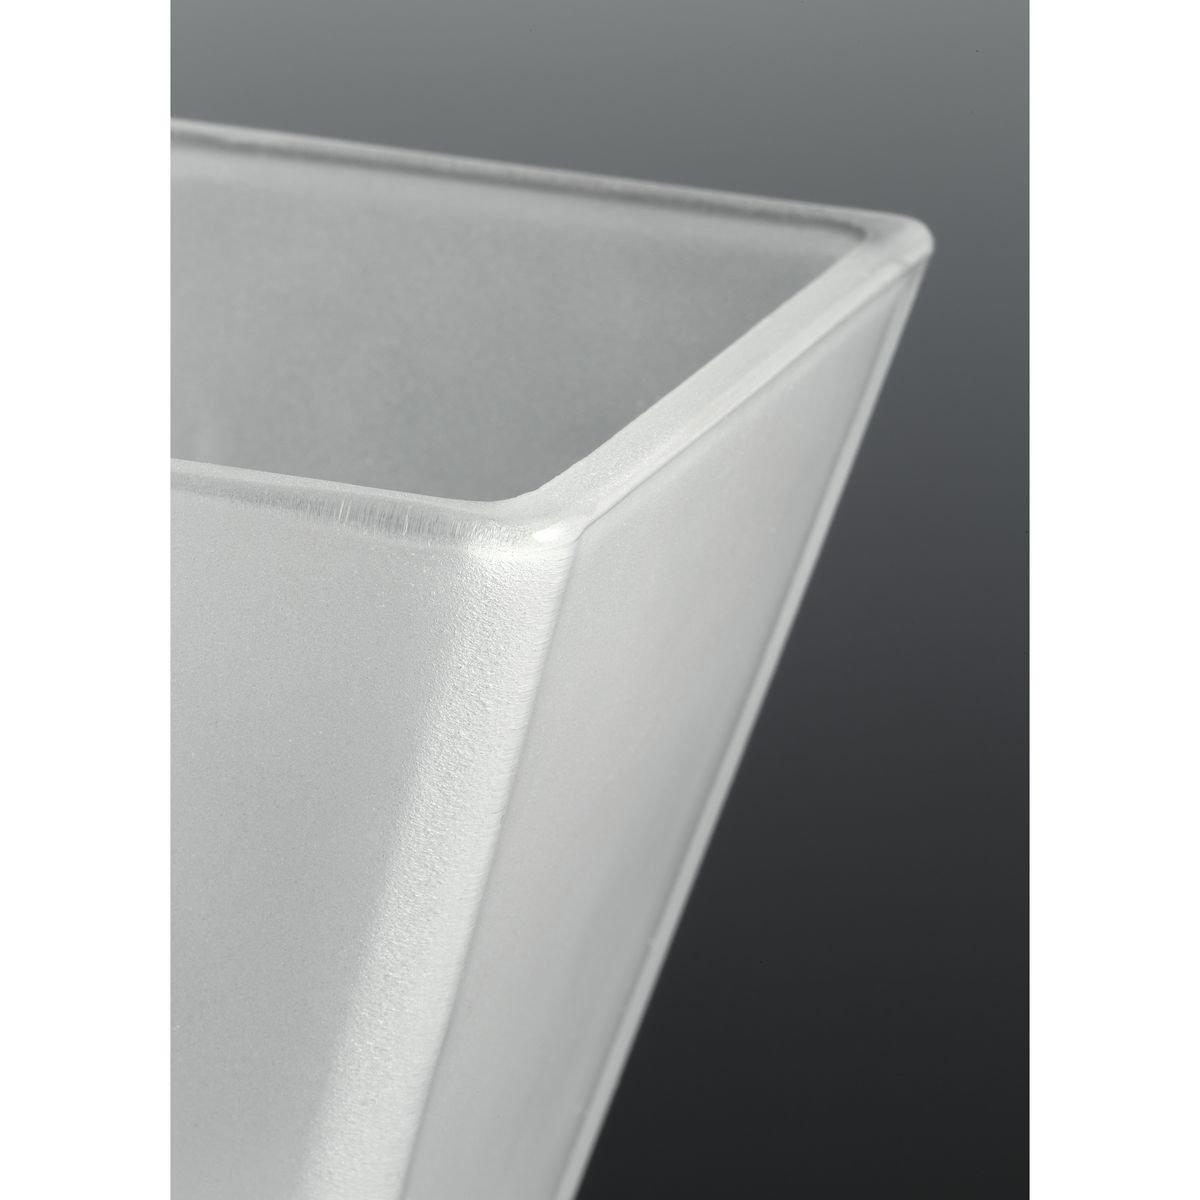 Progress Lighting Progress Lighting P2124-15 Contemporary//Modern 2-60W Kryp Bath Bracket Polished Chrome HI